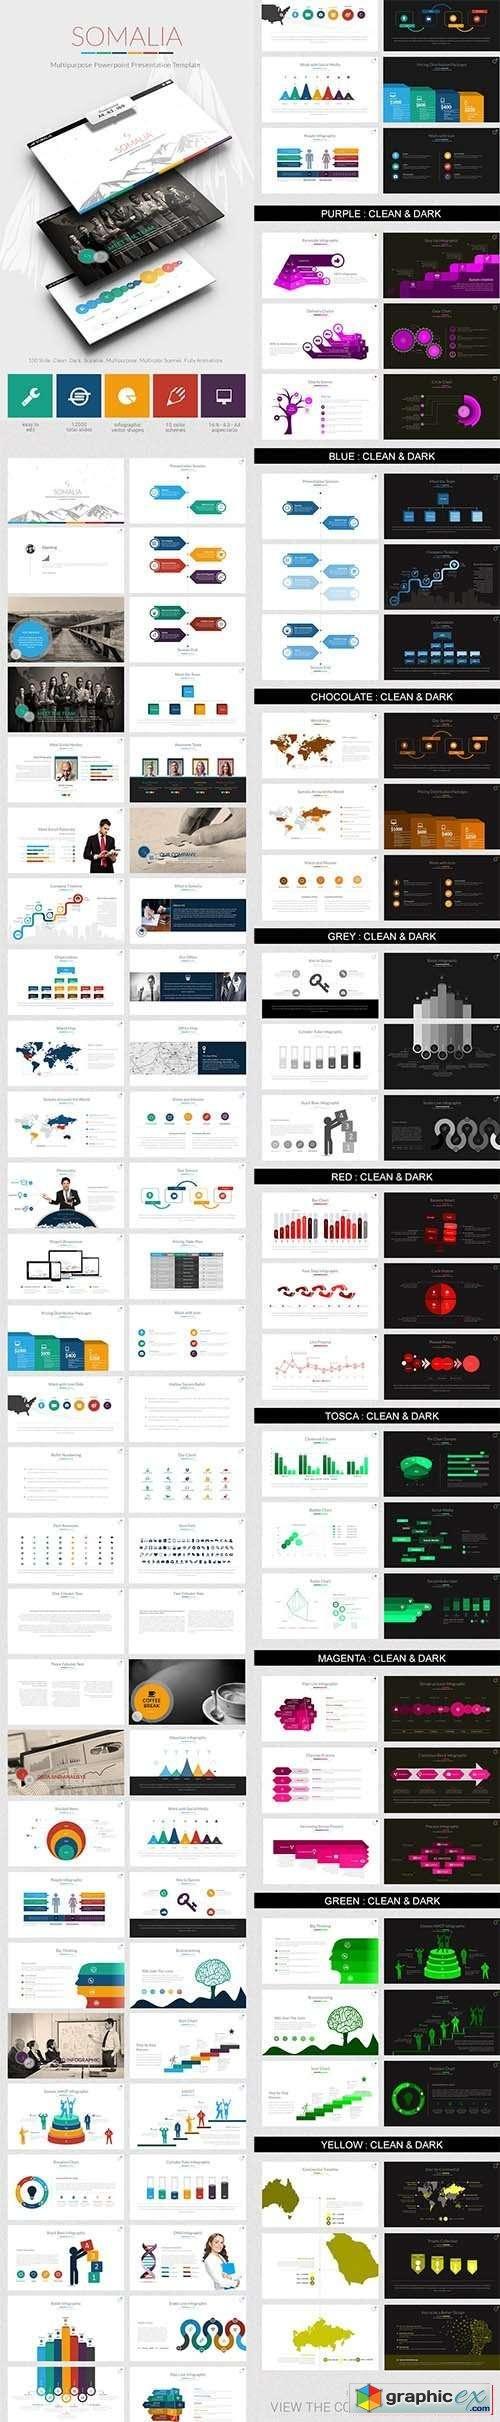 Somalia powerpoint presentation template free download vector somalia powerpoint presentation template toneelgroepblik Images